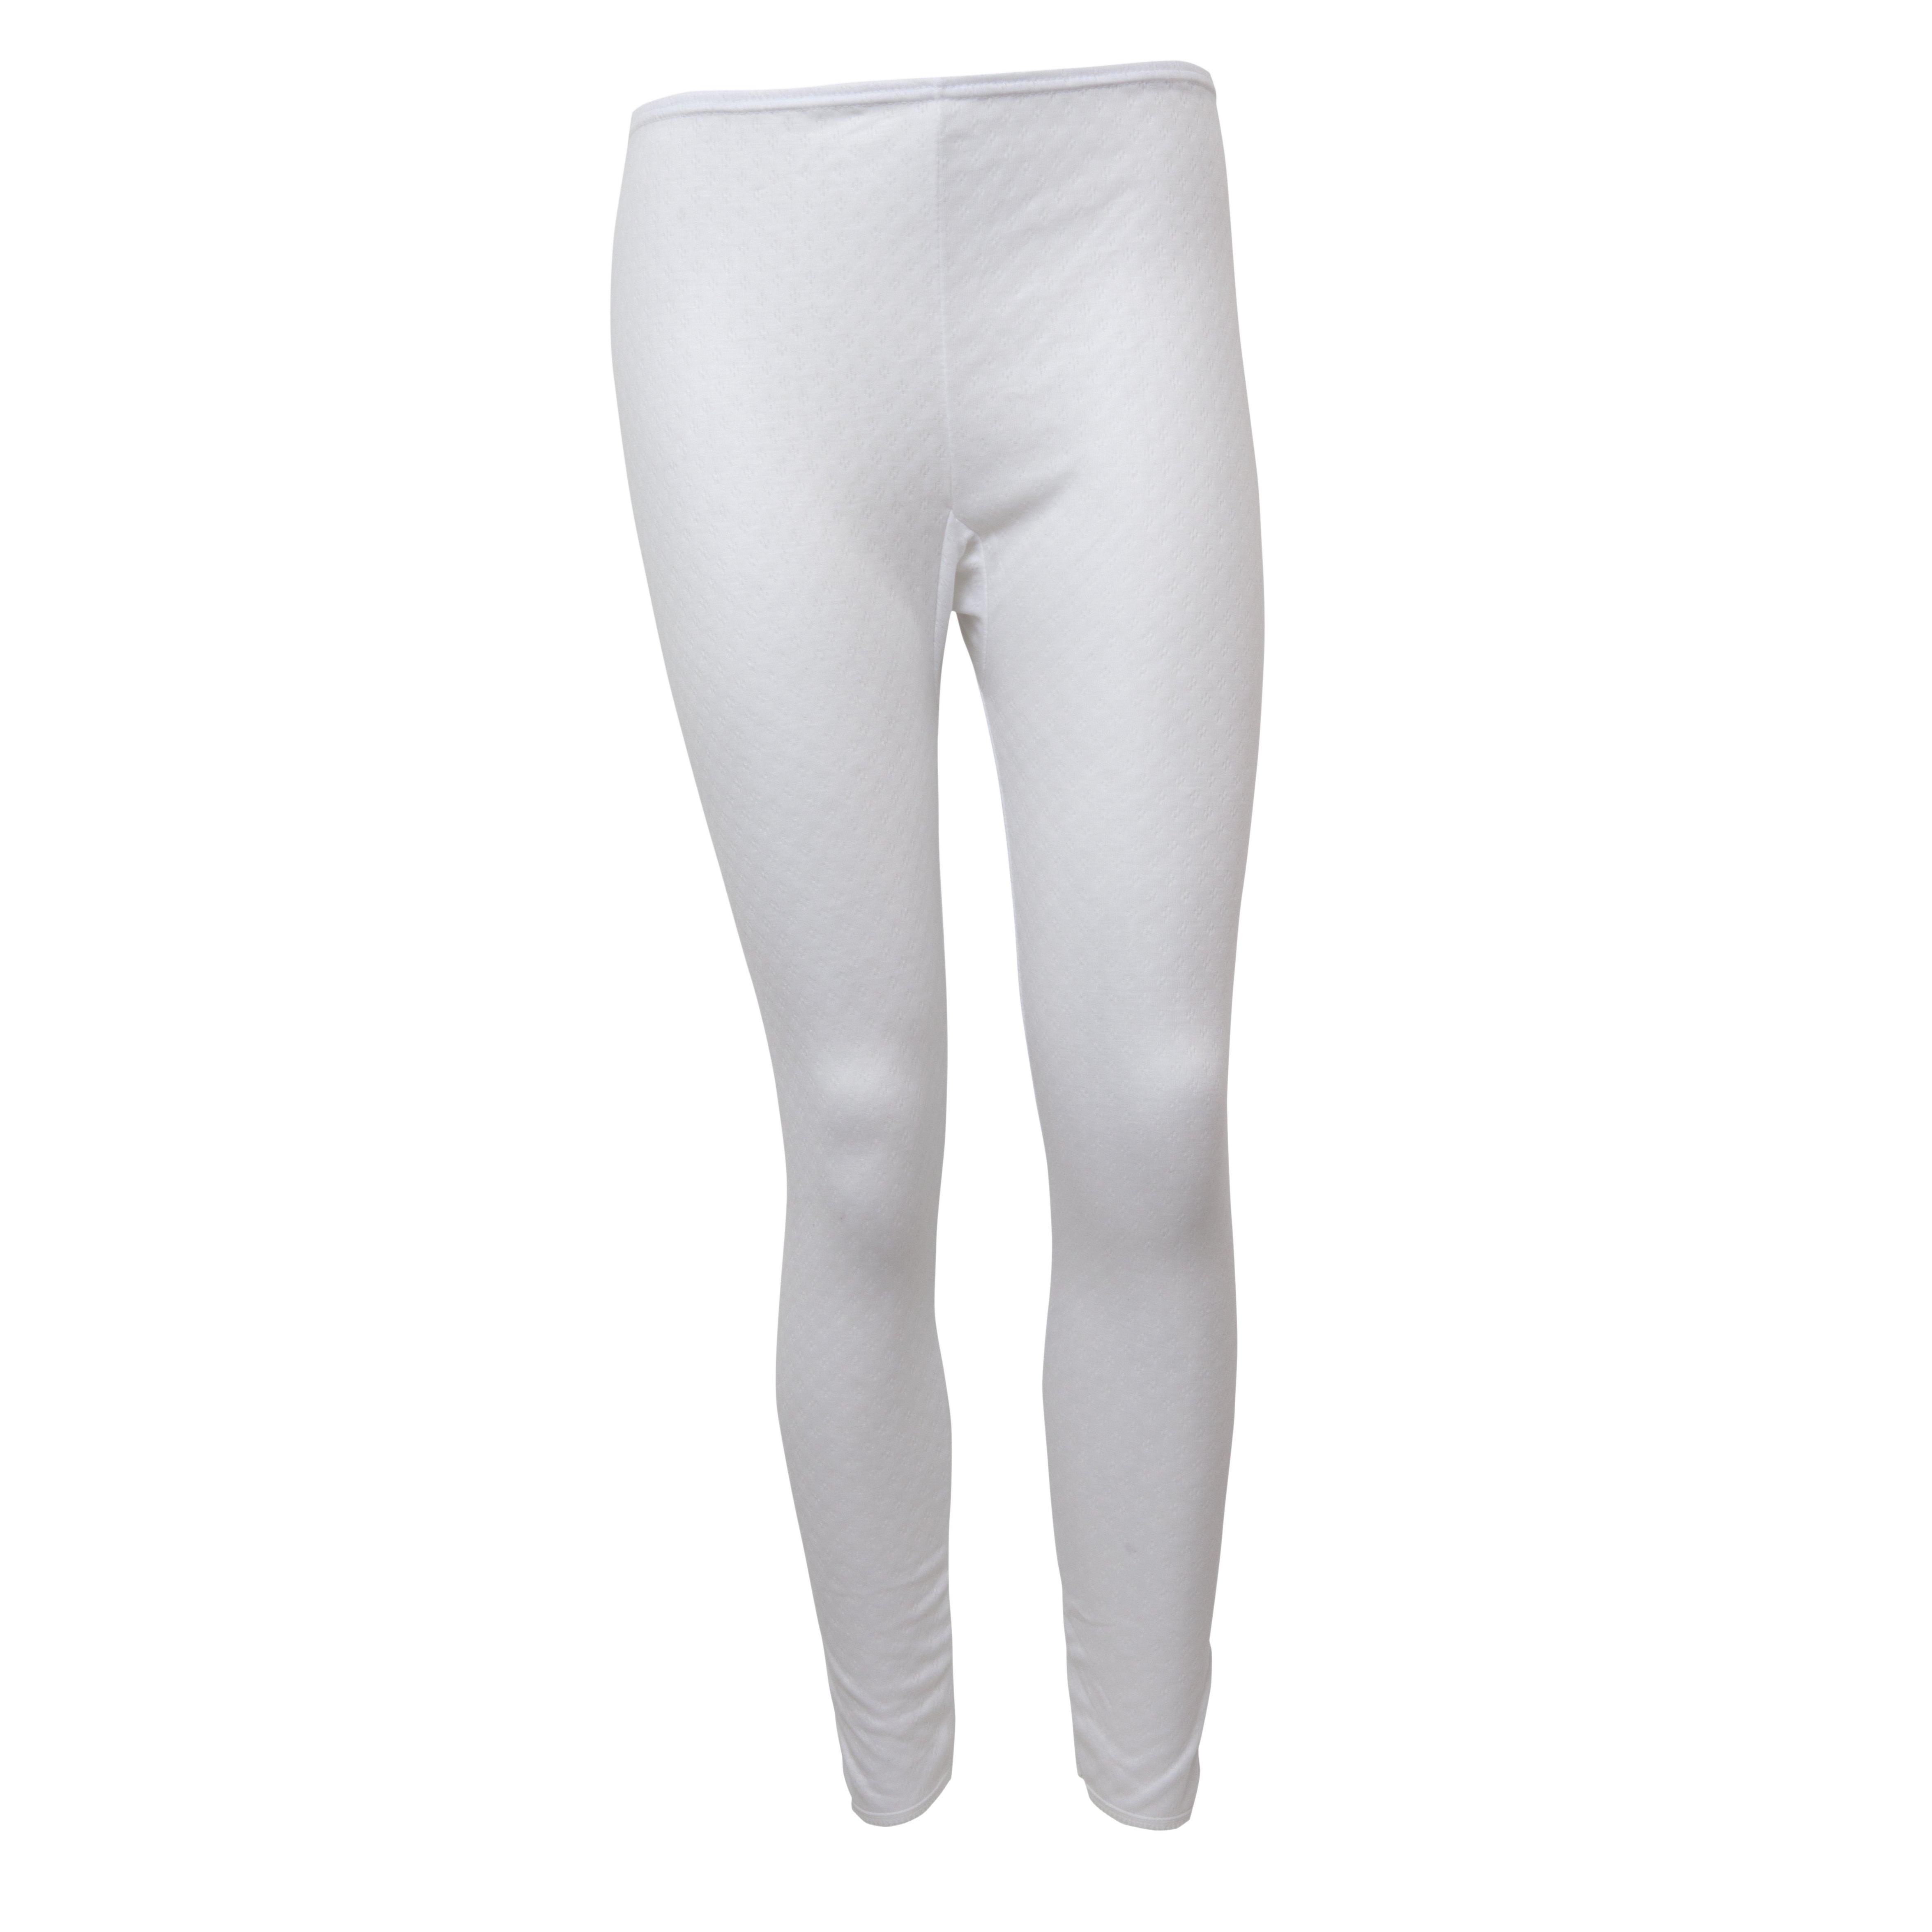 Ladies/Womens Thermal Underwear Long Jane (Heat Trap Range)